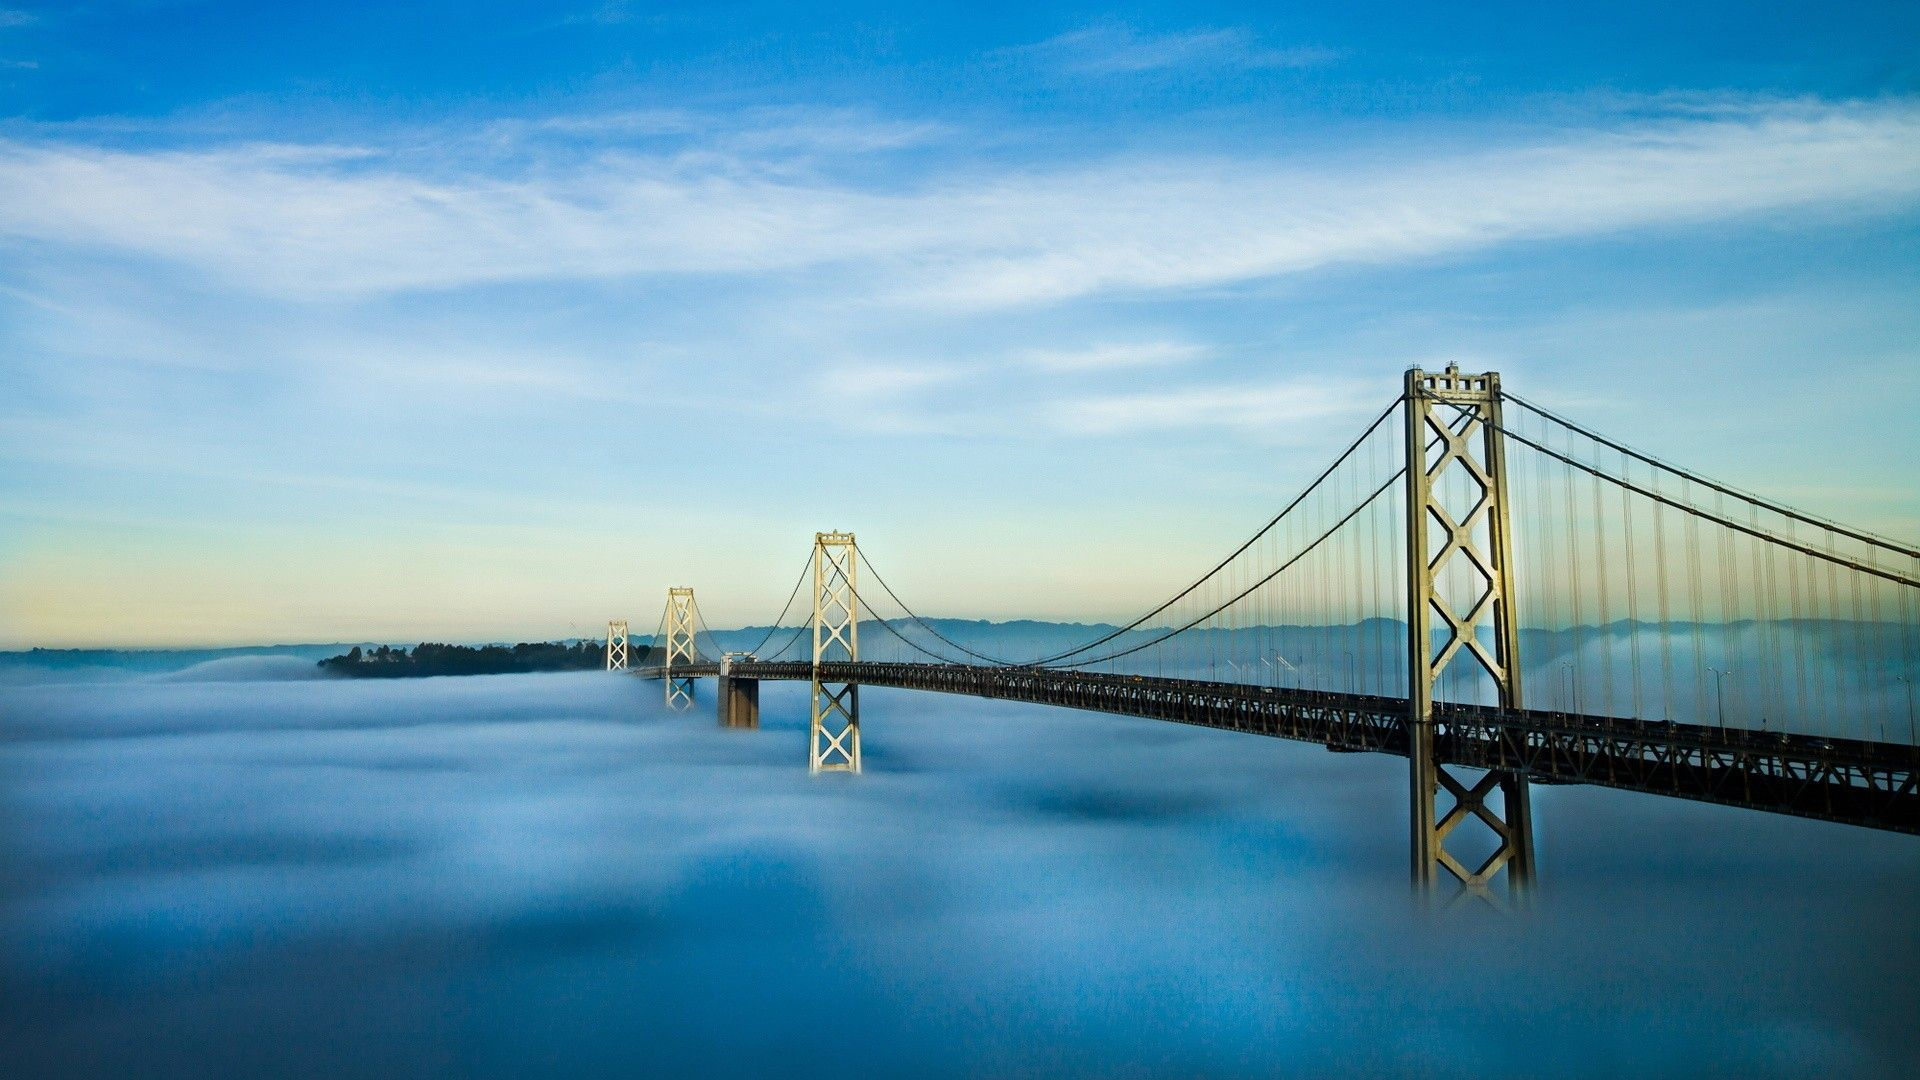 San Fransisco Bay Bridge HD desktop wallpaper Widescreen High